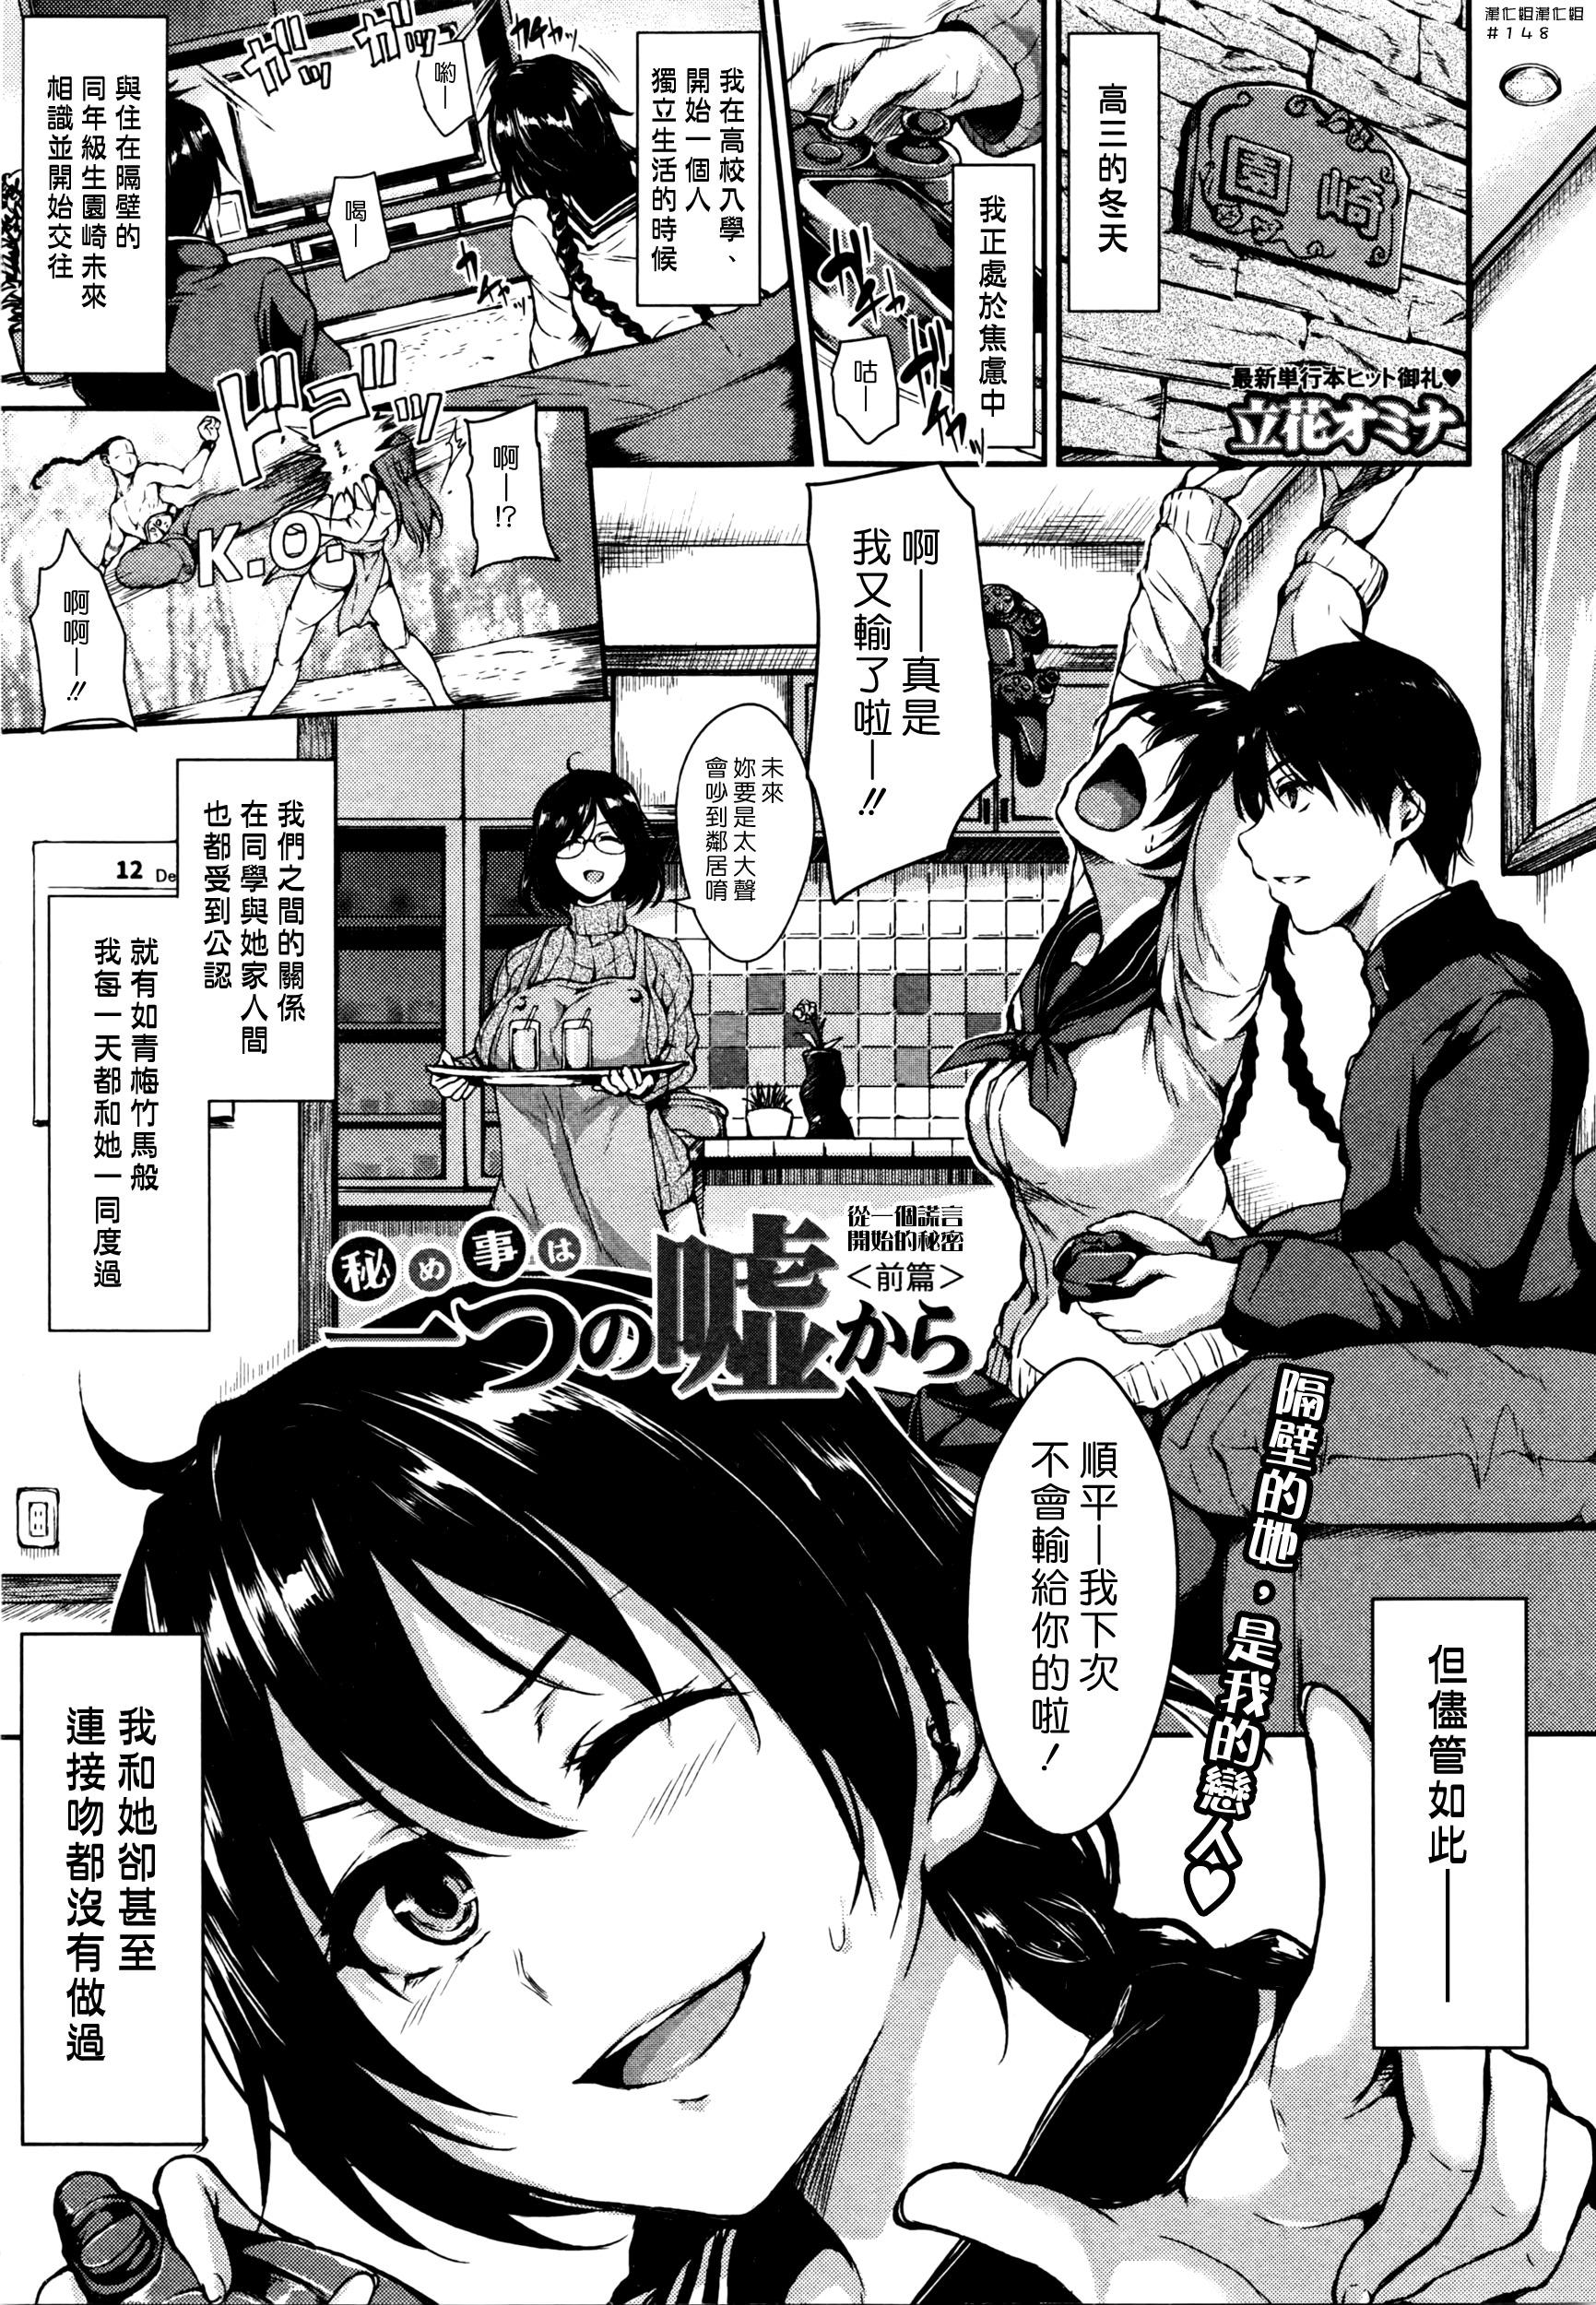 〖中文〗Himegoto wa Hitotsu no Uso kara    從一個謊言開始的秘密